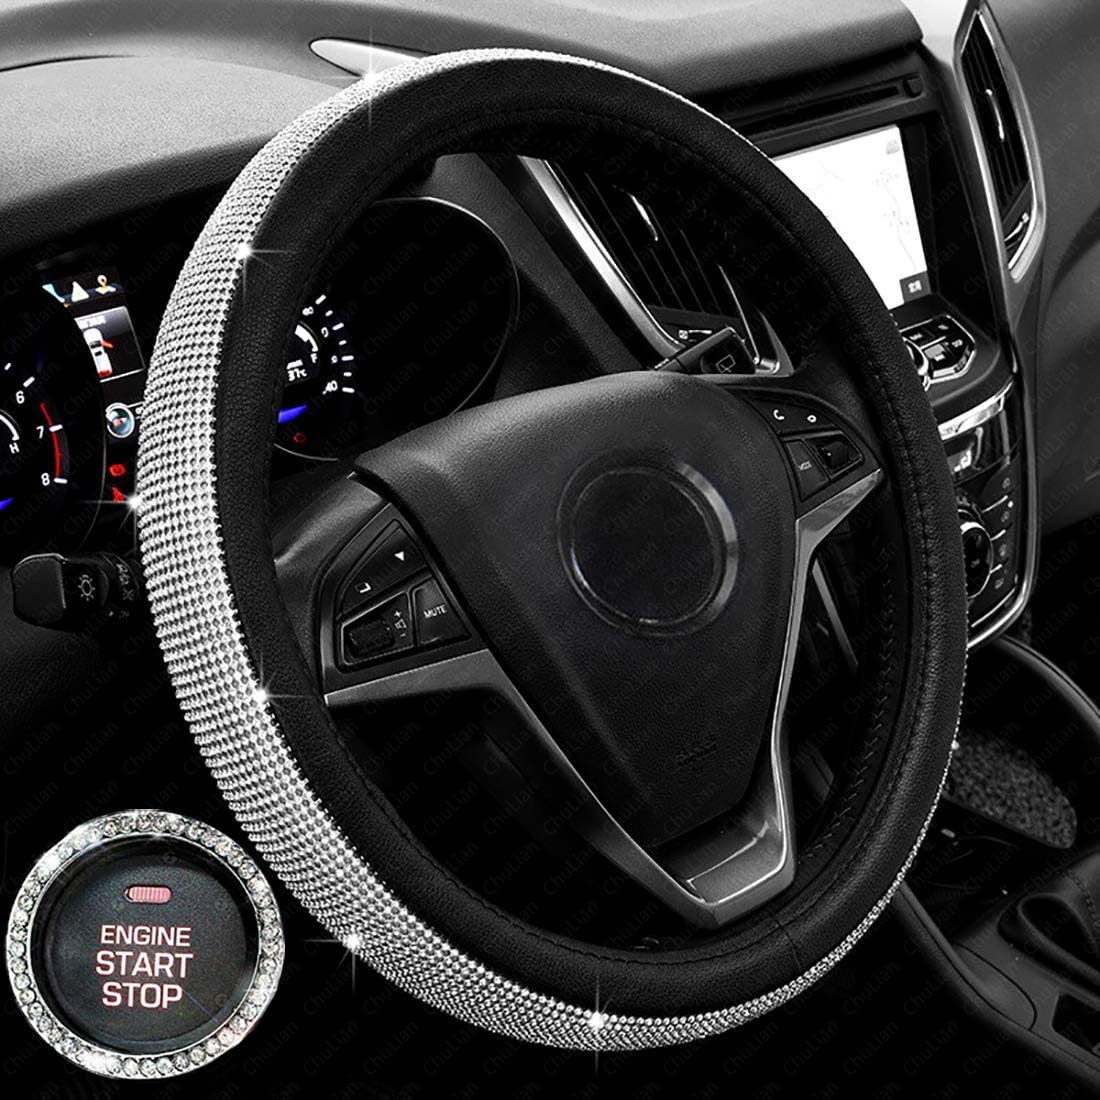 shop amazon com steering wheel coversnew diamond leather steering wheel cover with bling bling crystal rhinestones, universal fit 15 inch